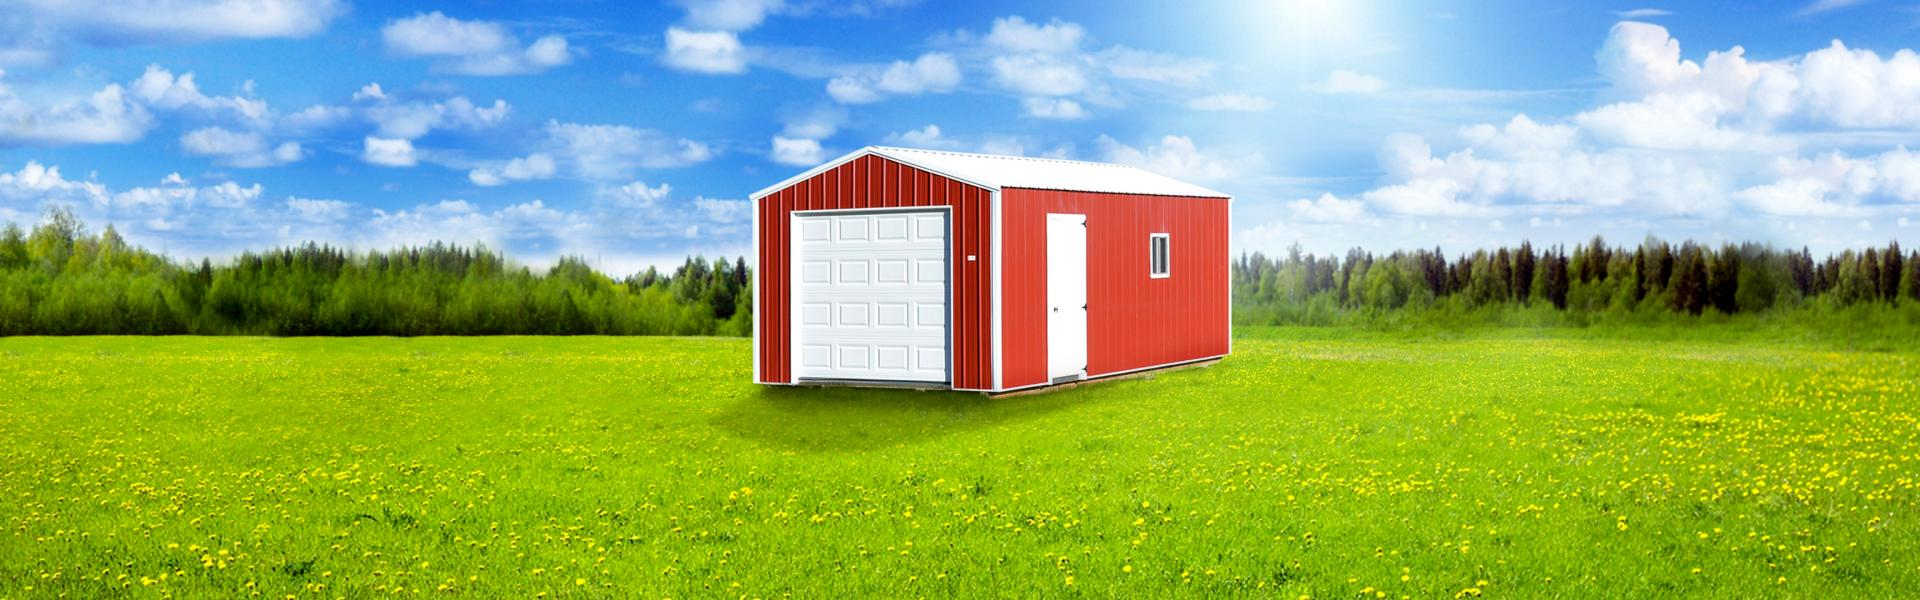 Garages | Raber Portable Storage Barns